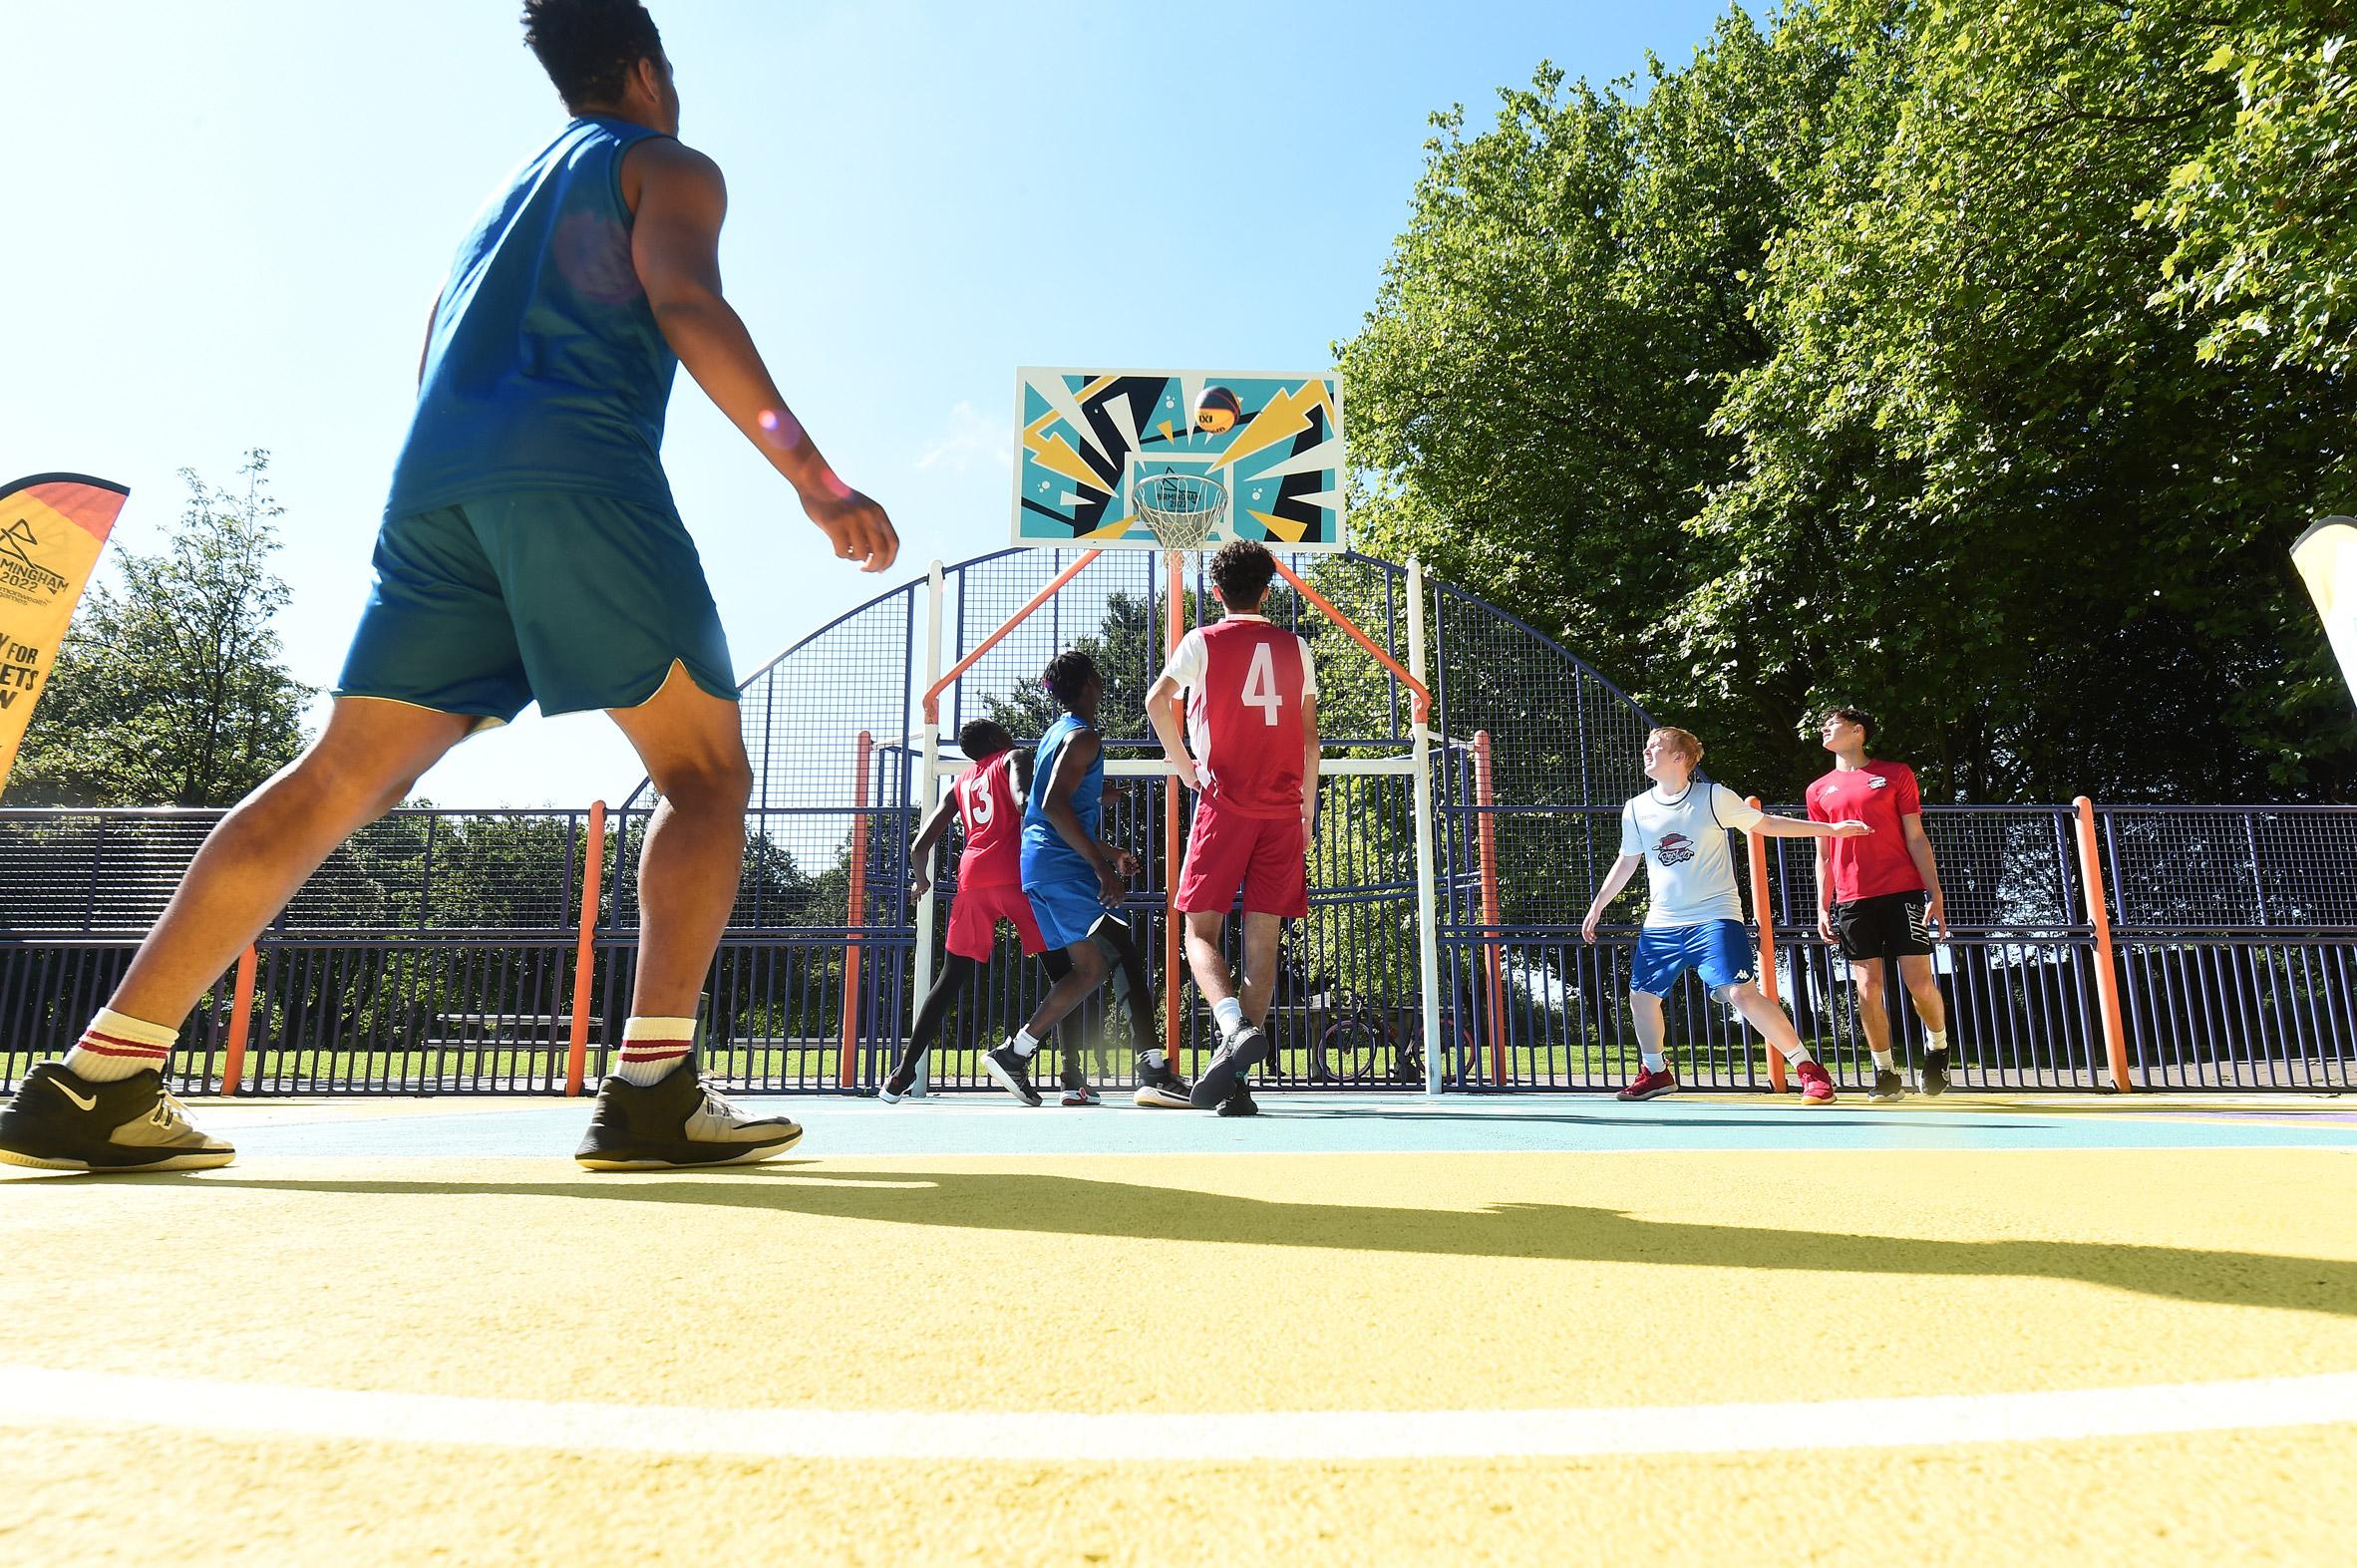 Players play a basketball match in Summerfield Park court